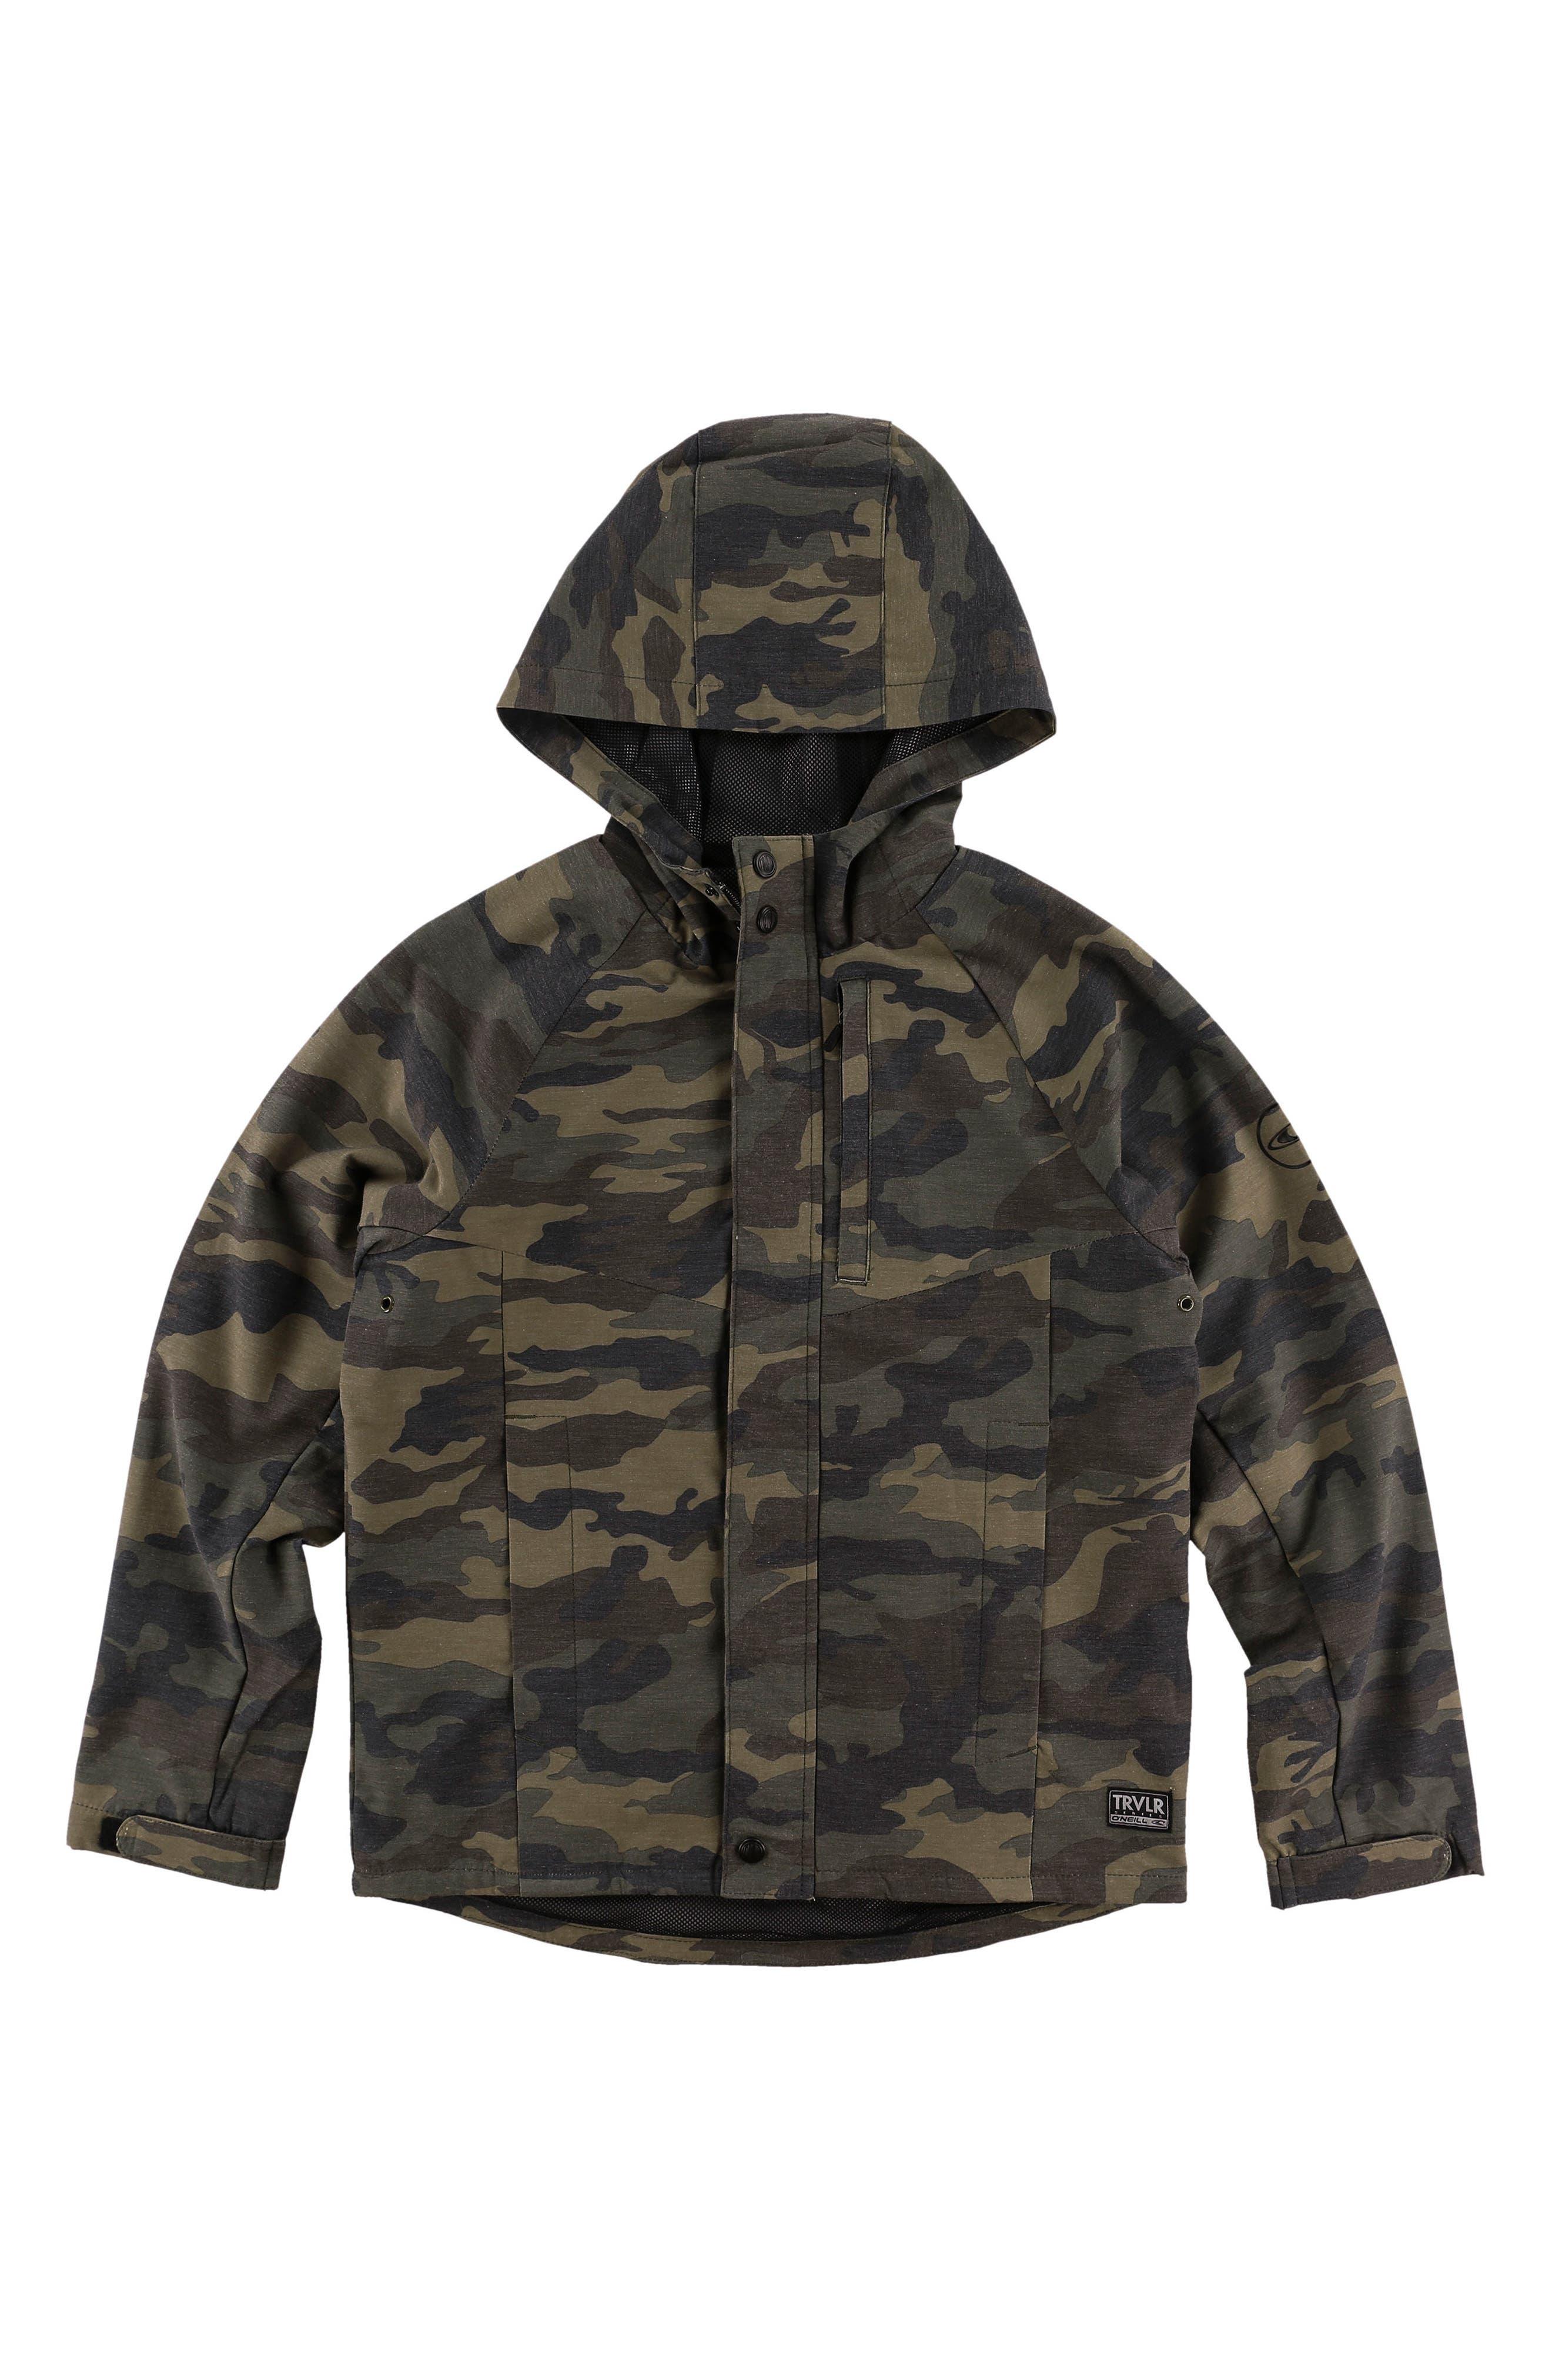 Traveler Dawn Patrol Camo Hooded Windbreaker Jacket,                         Main,                         color, Camo